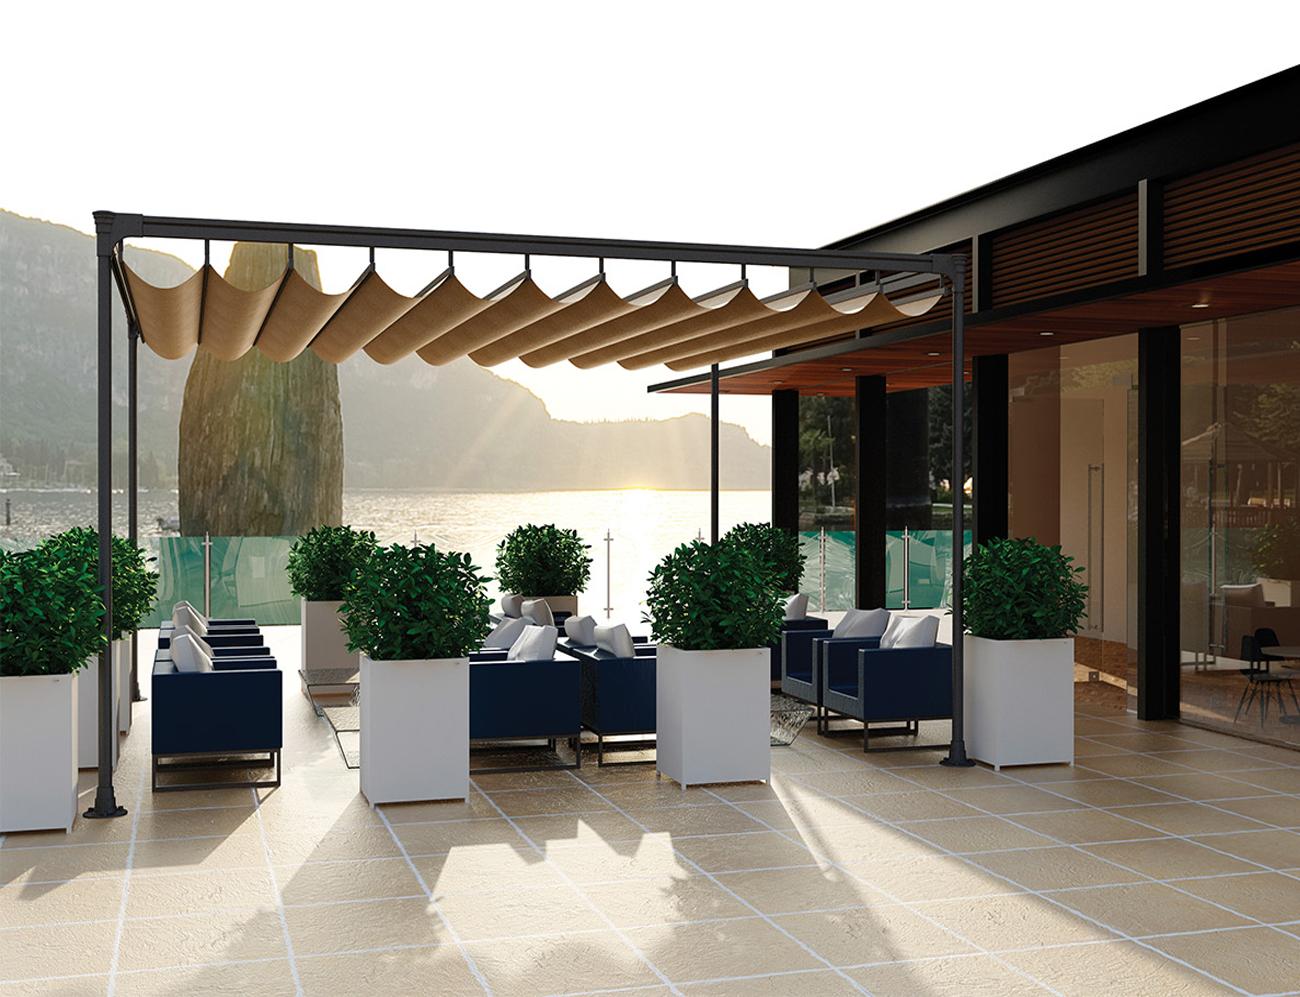 Toldos de lona para terrazas terraza compuesta de toldos - Lonas para terrazas ...